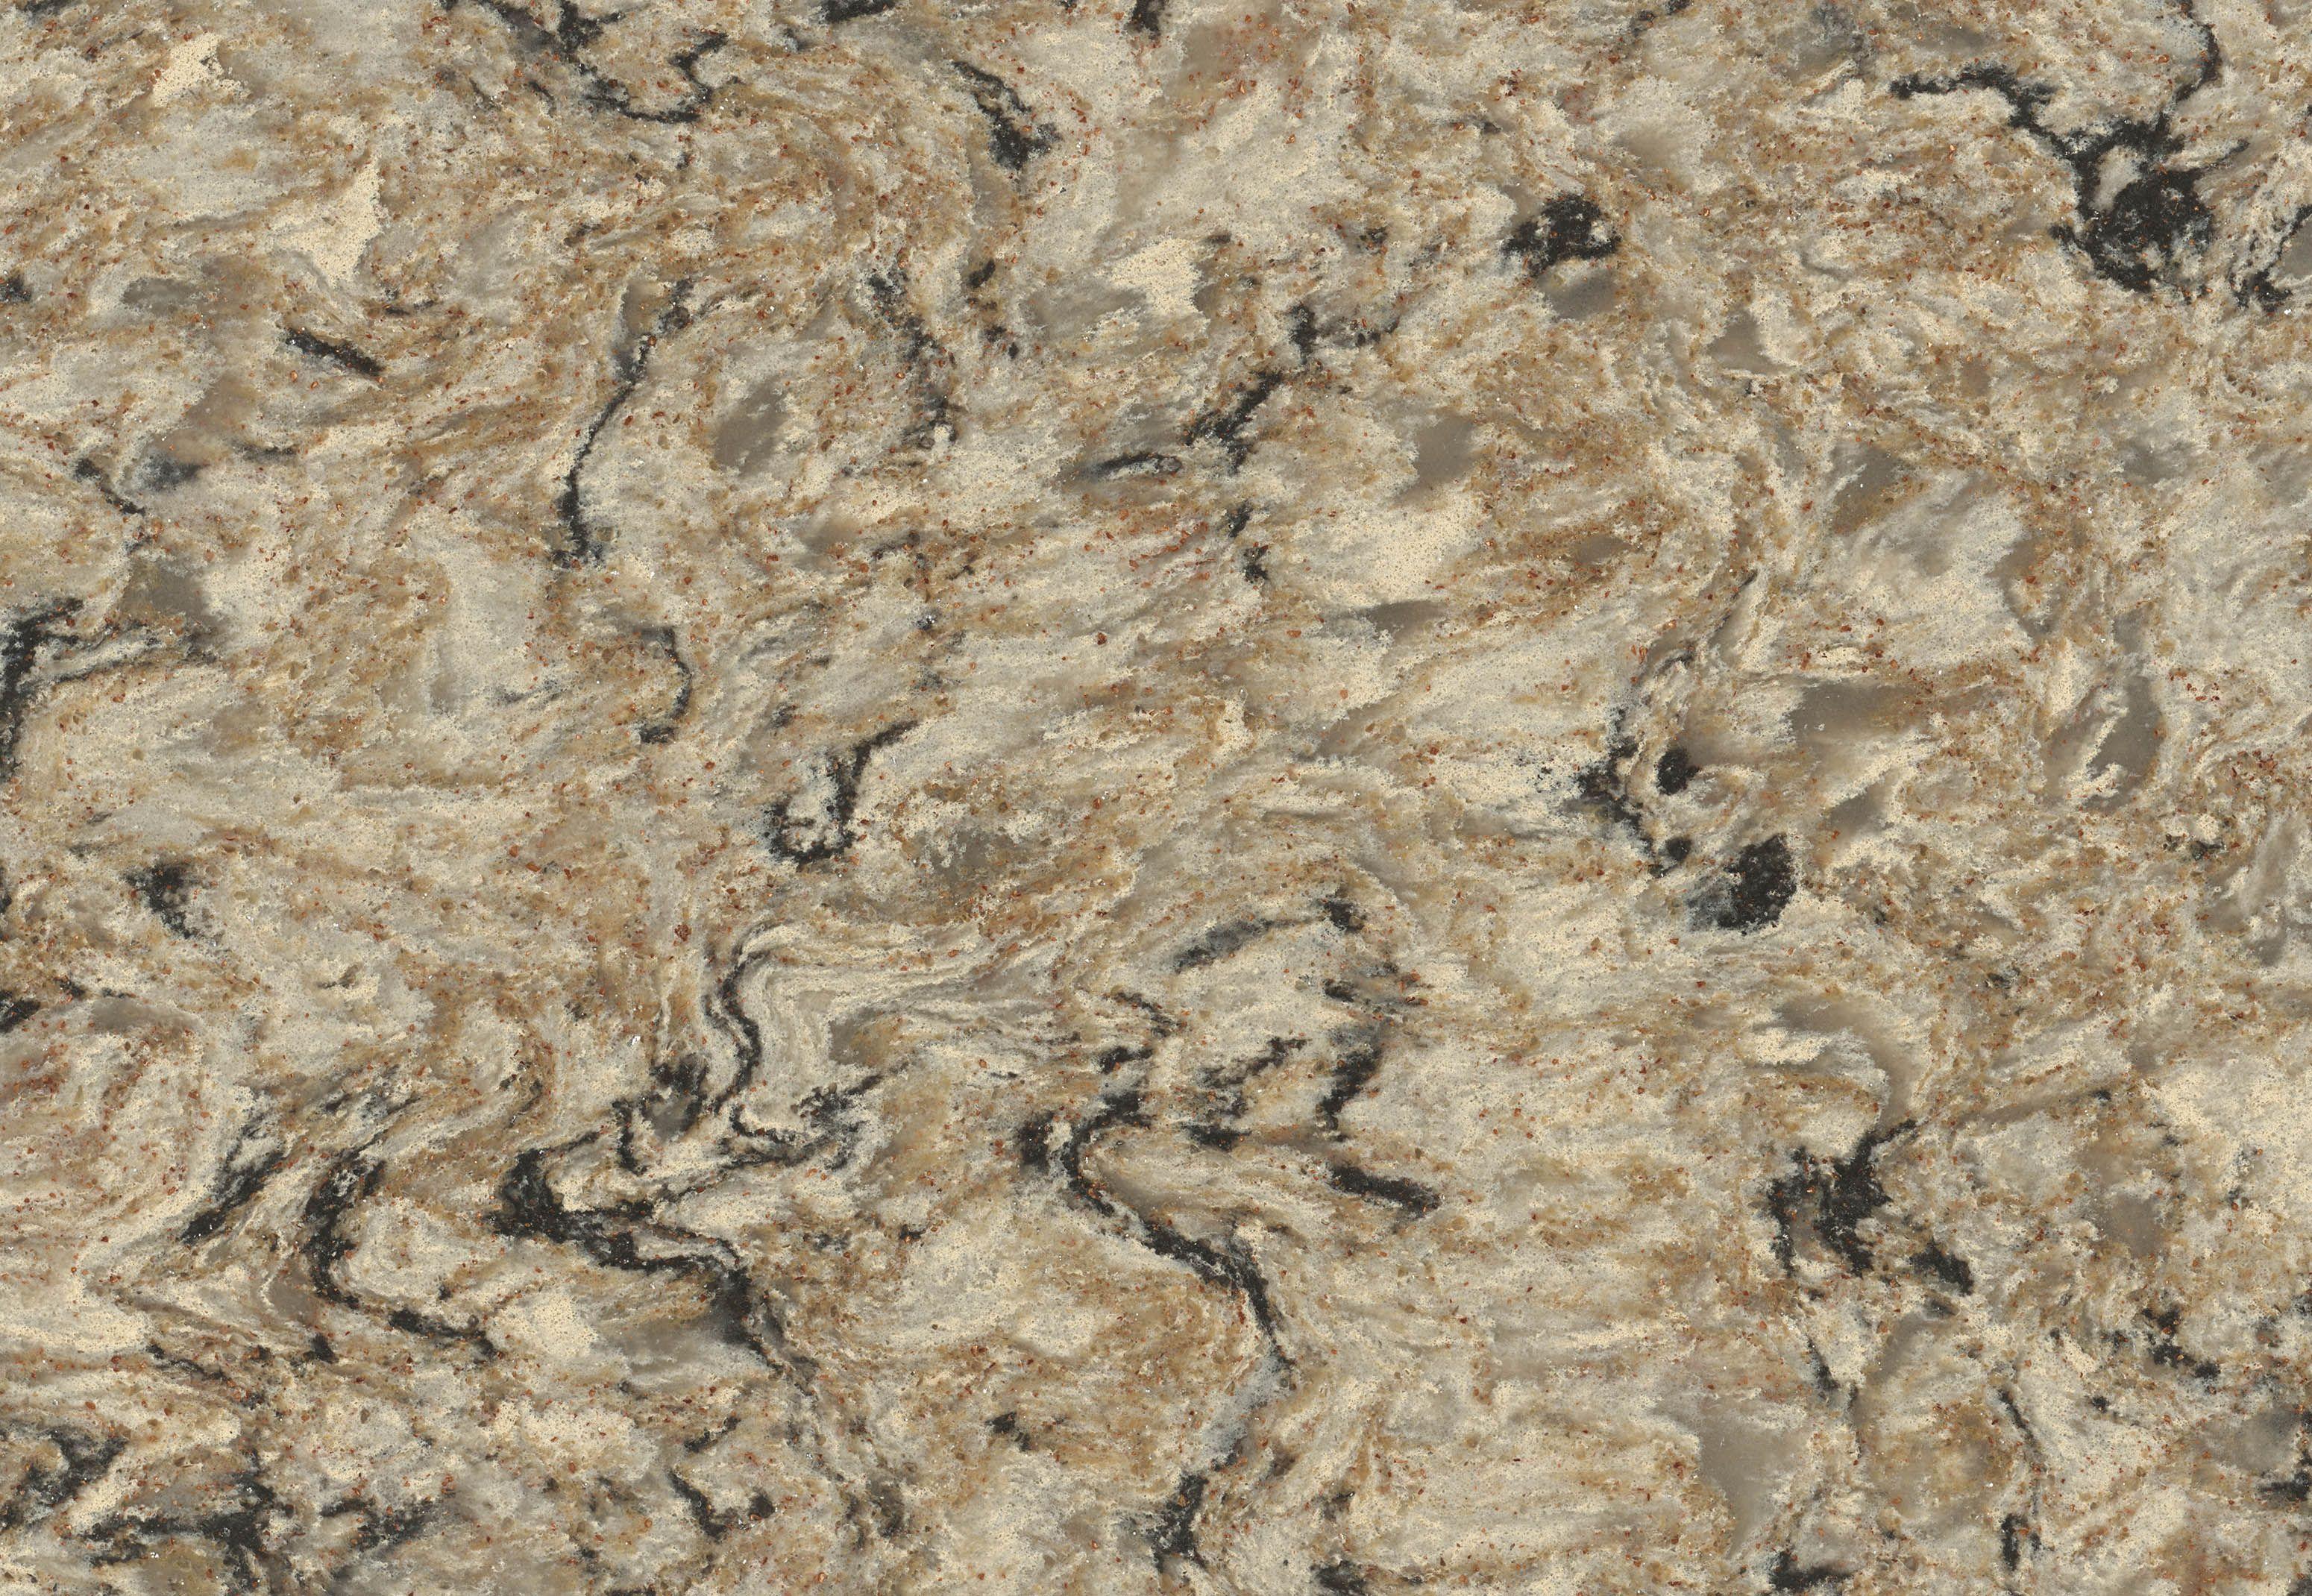 publizzity photos granite quartz rhpinterestcom countertops overlake com from samples allen roth countertop loweus is kitchen what rhlooharvestcom ideas